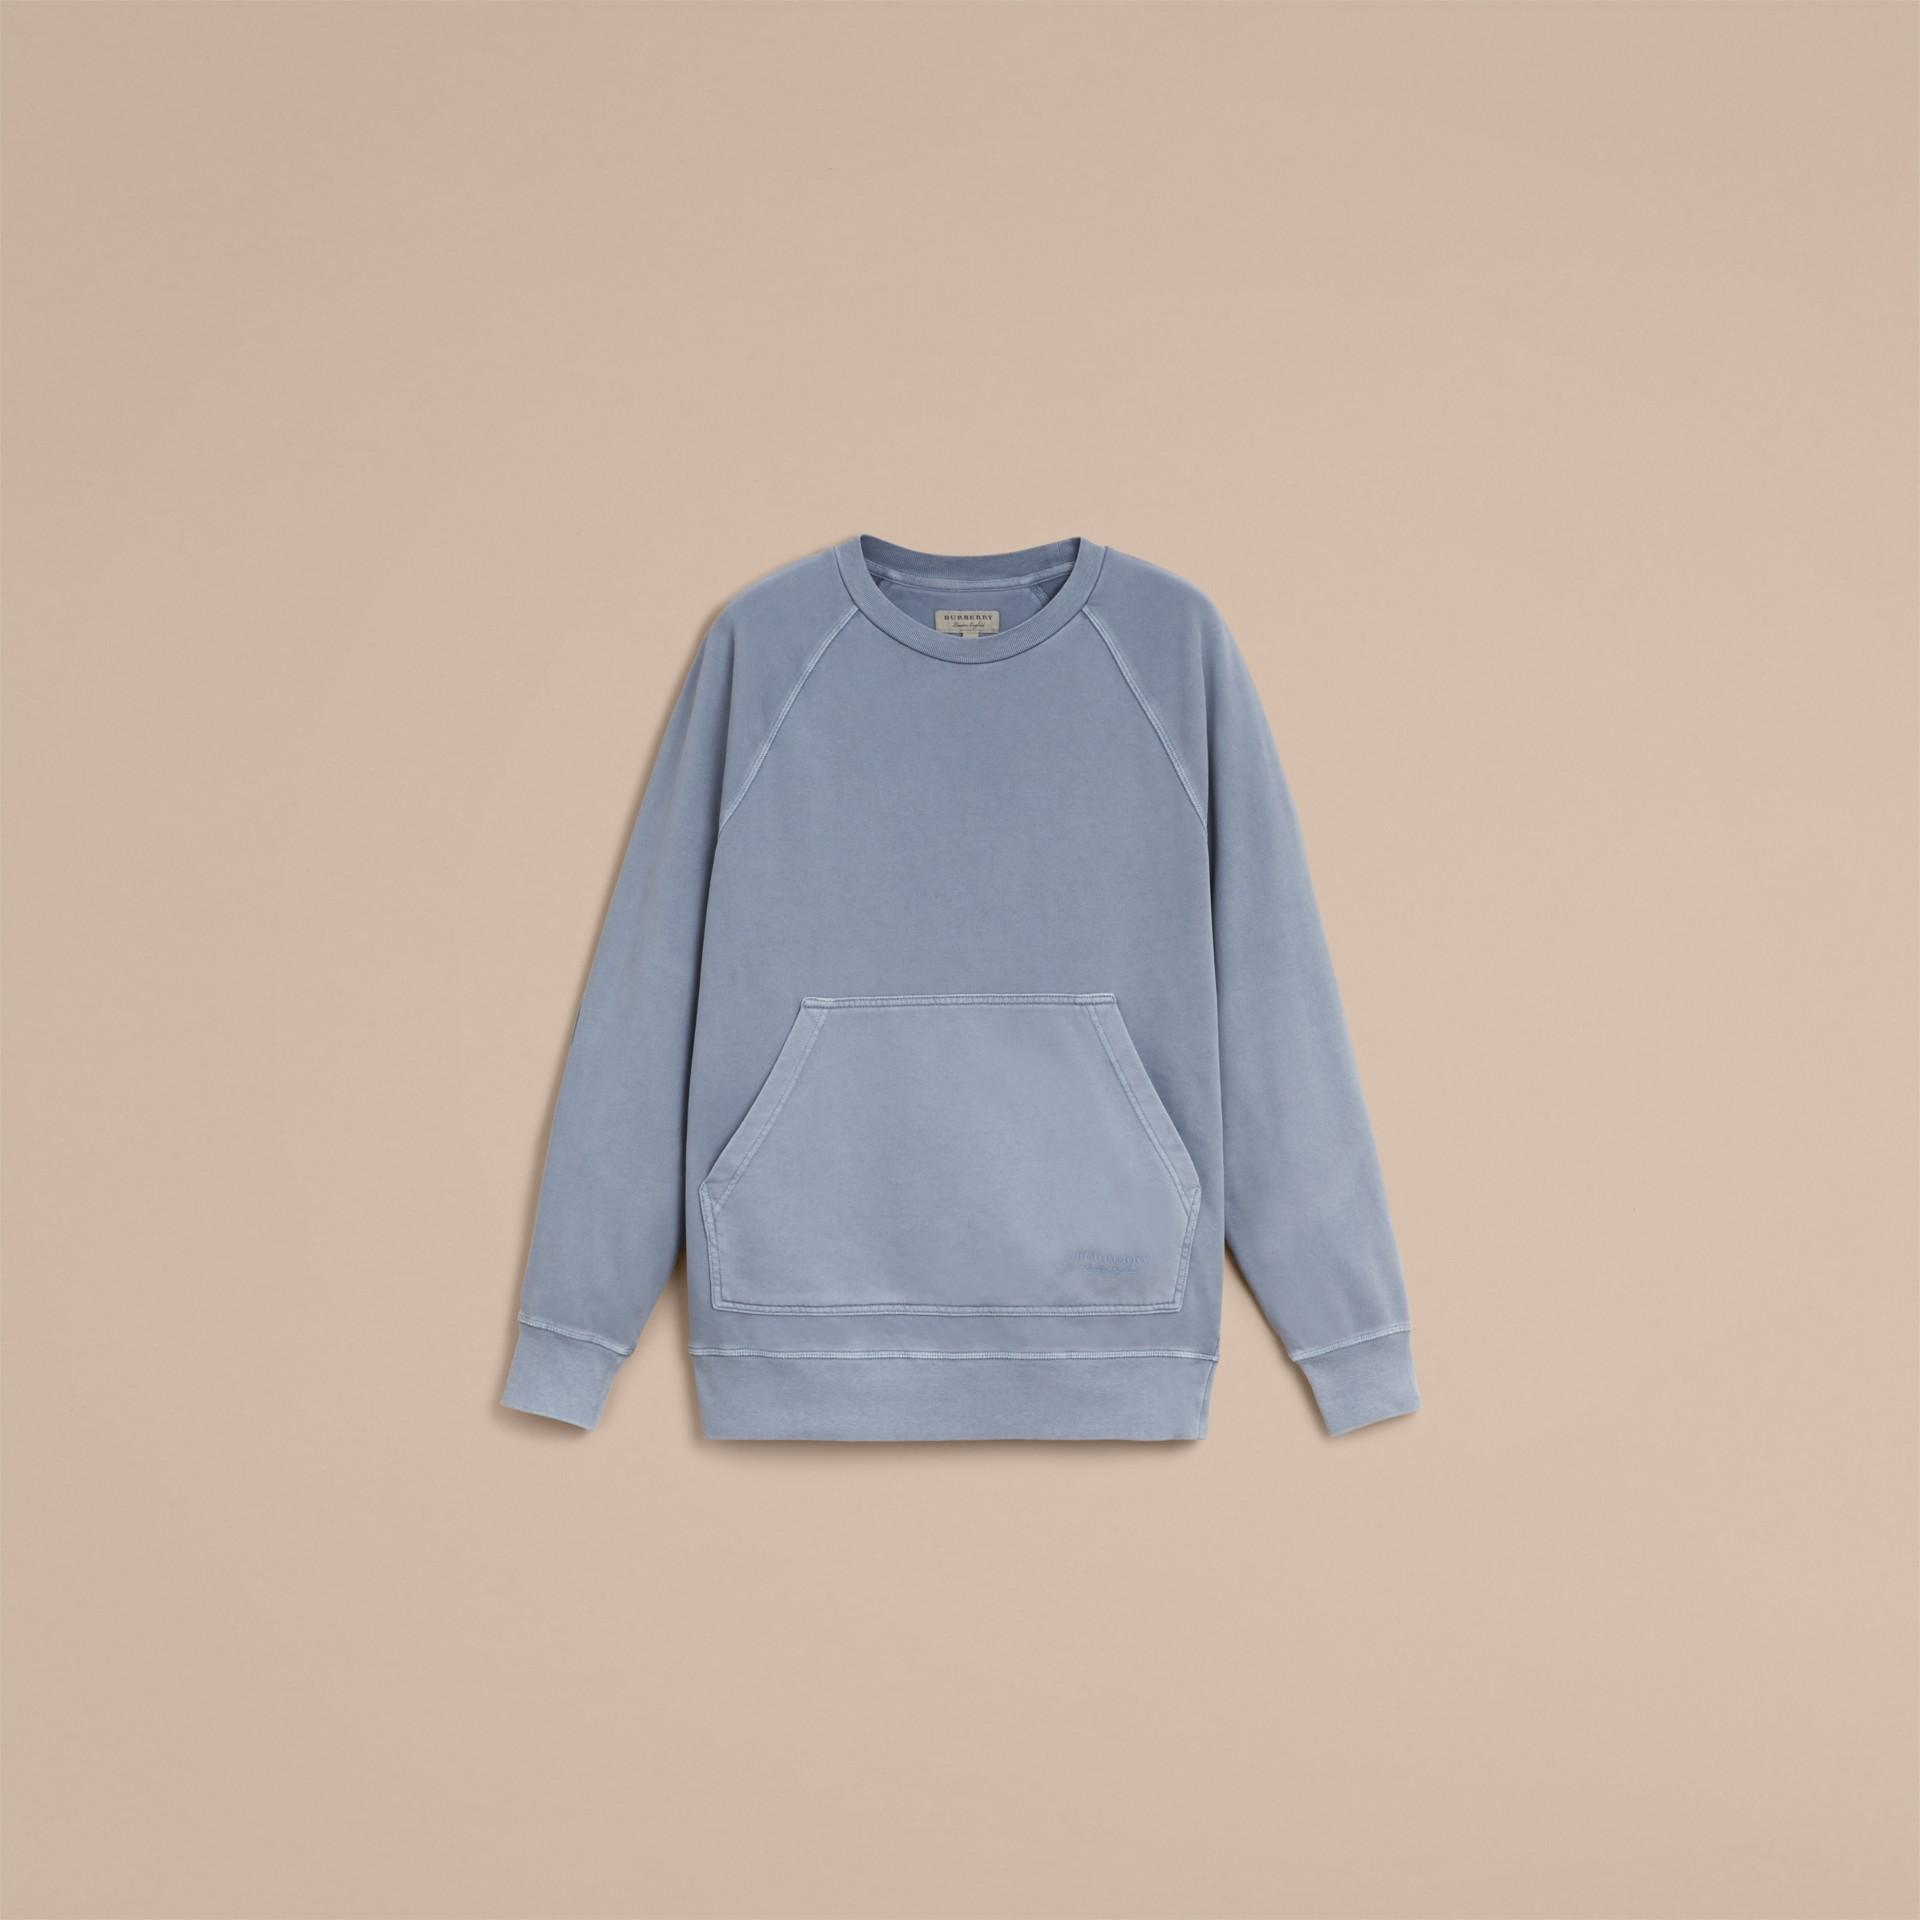 Unisex Pigment-dyed Cotton Oversize Sweatshirt in Dusty Blue - Women | Burberry Australia - gallery image 4